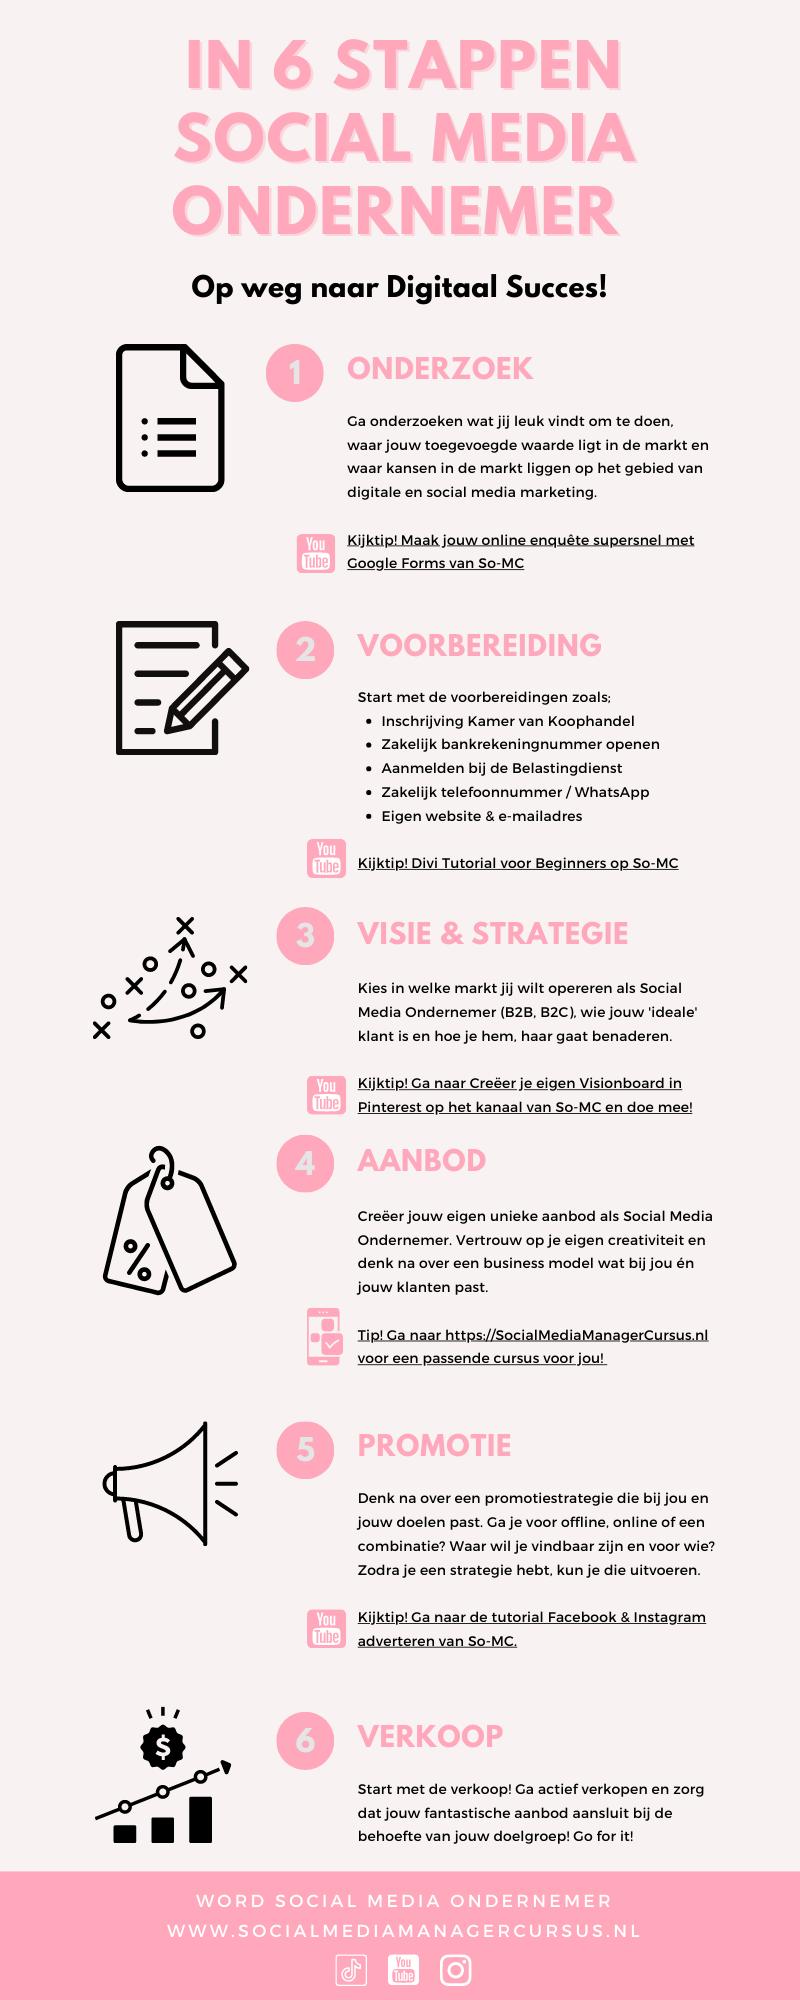 In 6 stappen Social Media Ondernemer